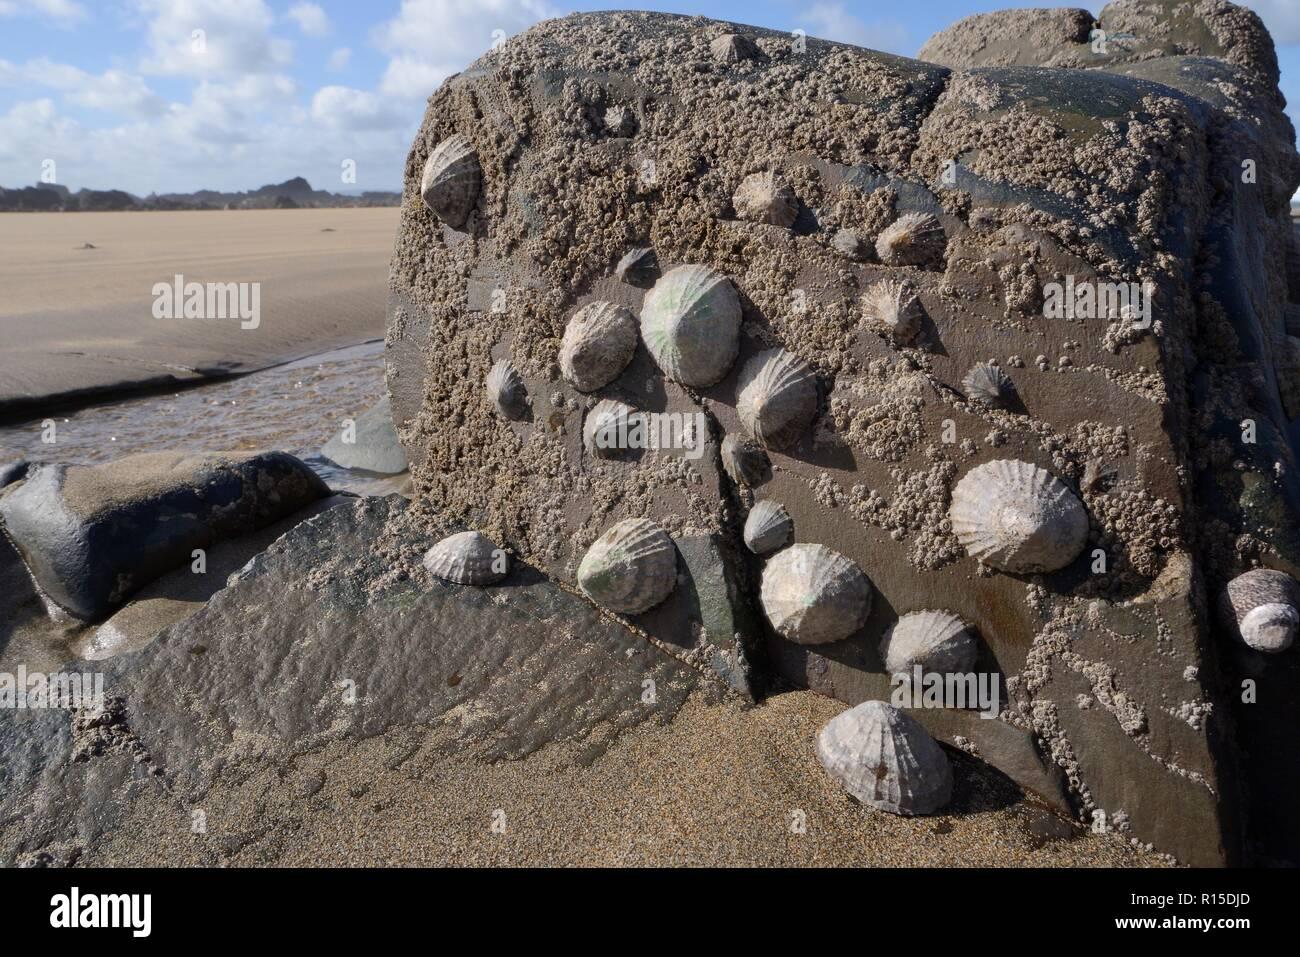 Common limpets (Patella vulgata) and Acorn barnacles (Semibalanus balanoides) attached to intertidal rocks, exposed by a falling tide, Cornwall, UK Stock Photo